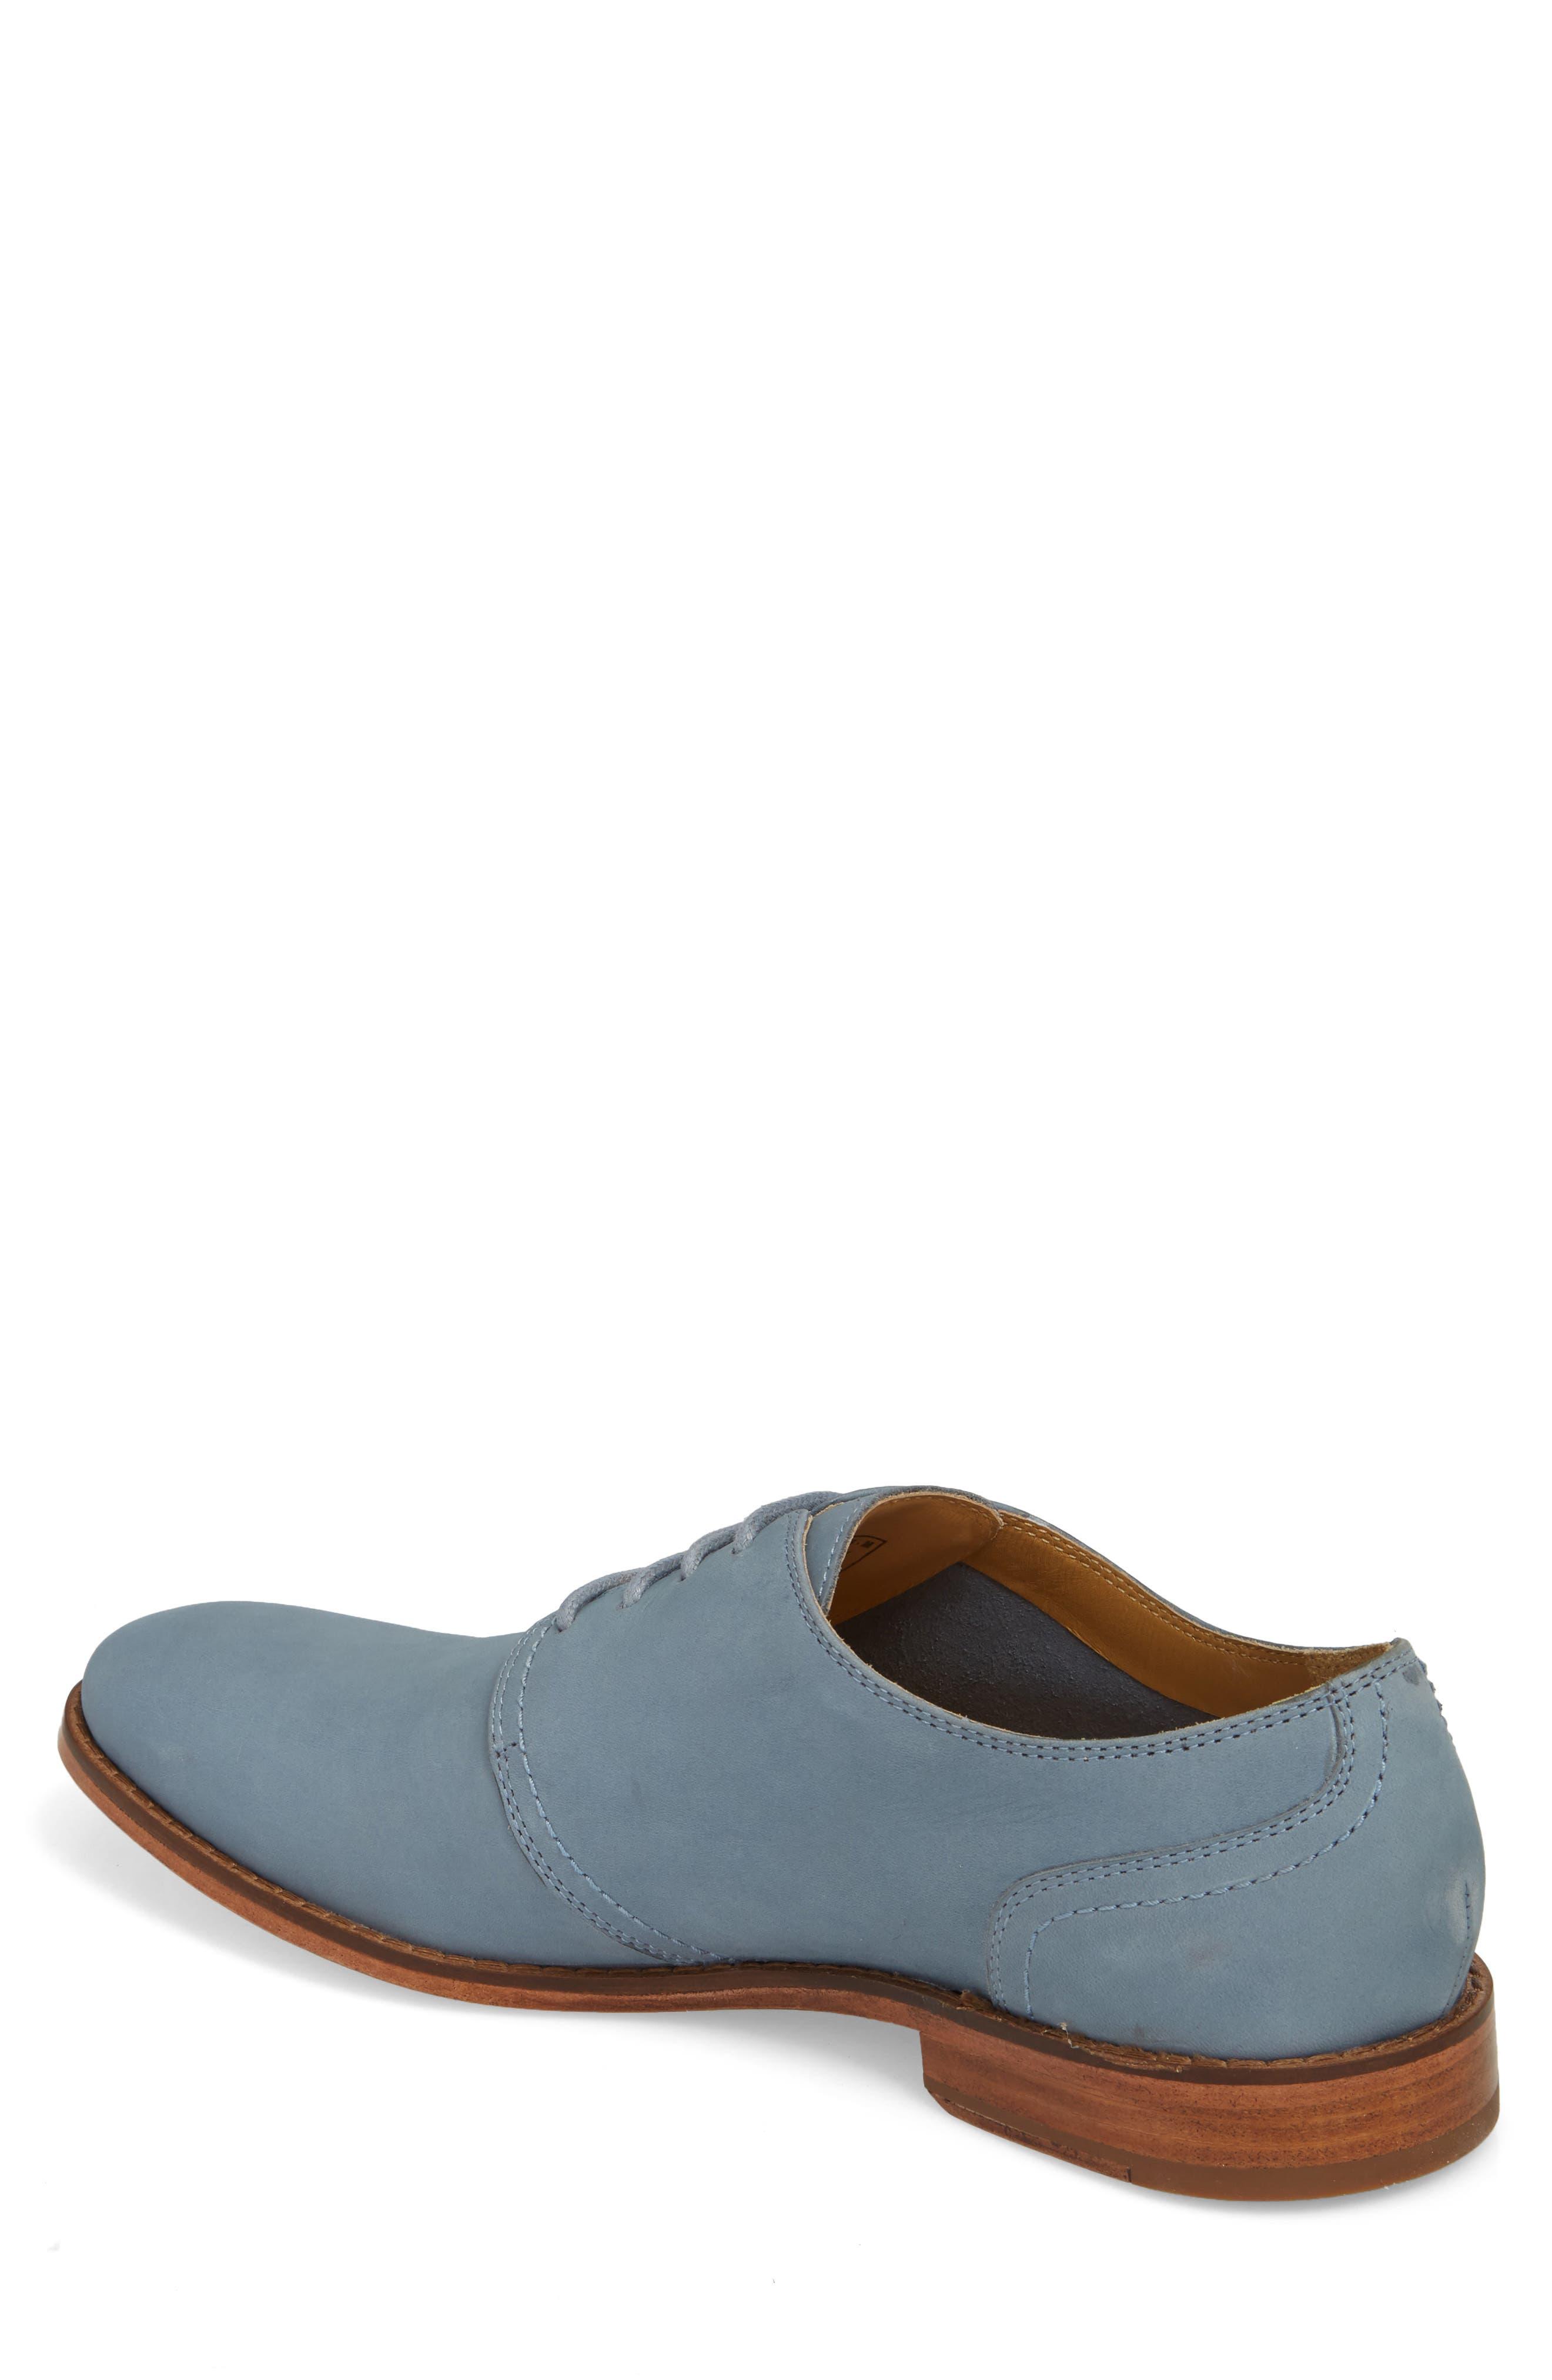 Caan Plain Toe Derby,                             Alternate thumbnail 2, color,                             Flint Stone Leather